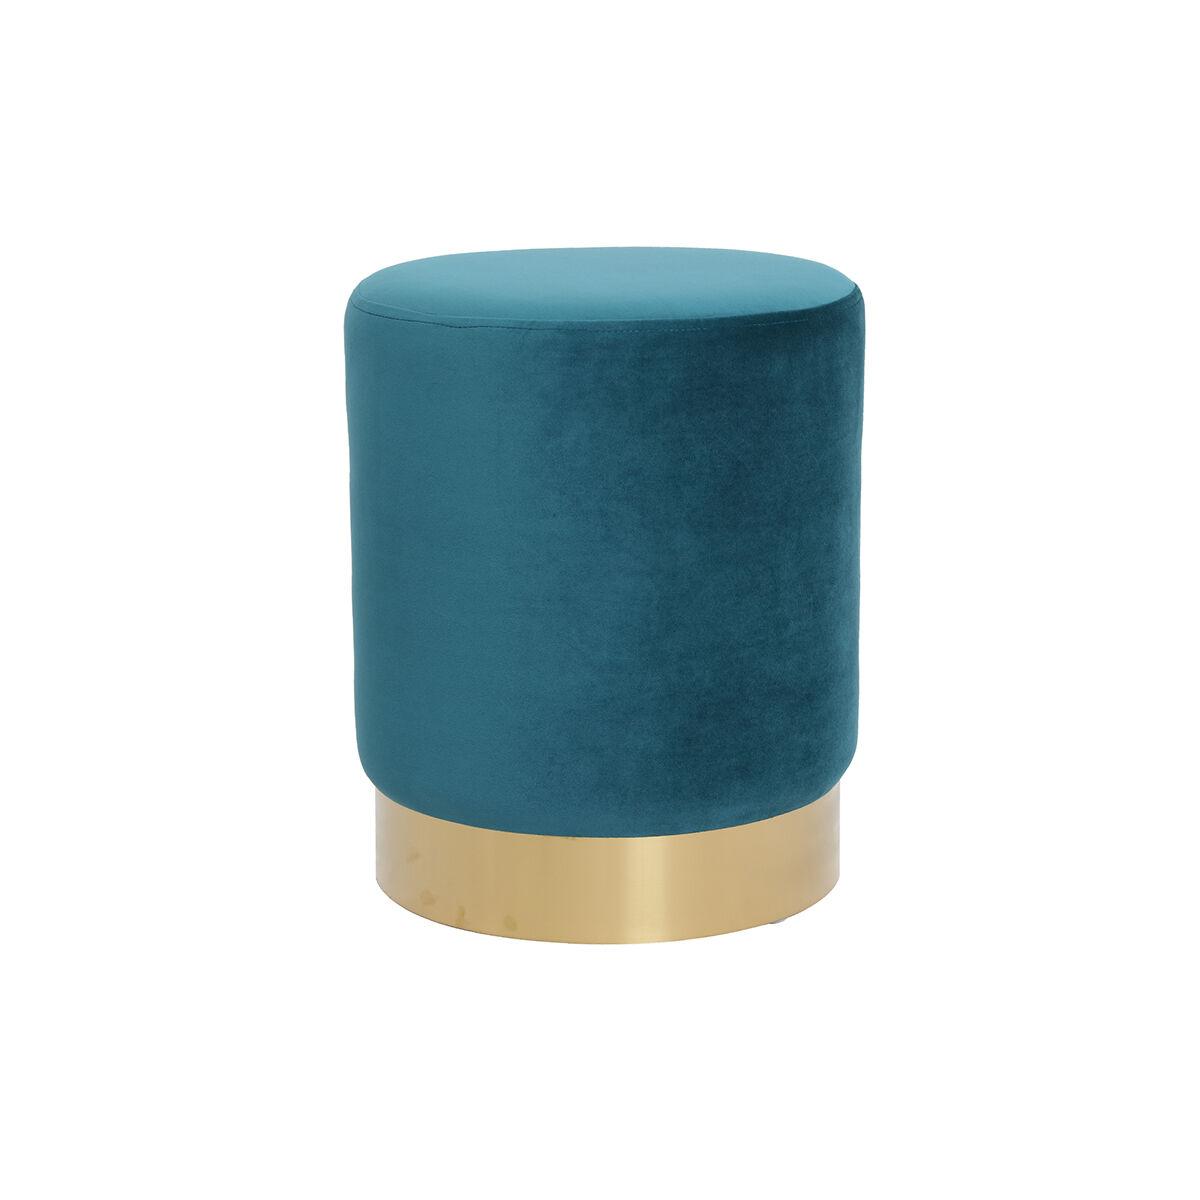 Miliboo Pouf rond en velours bleu canard et métal doré AMAYA